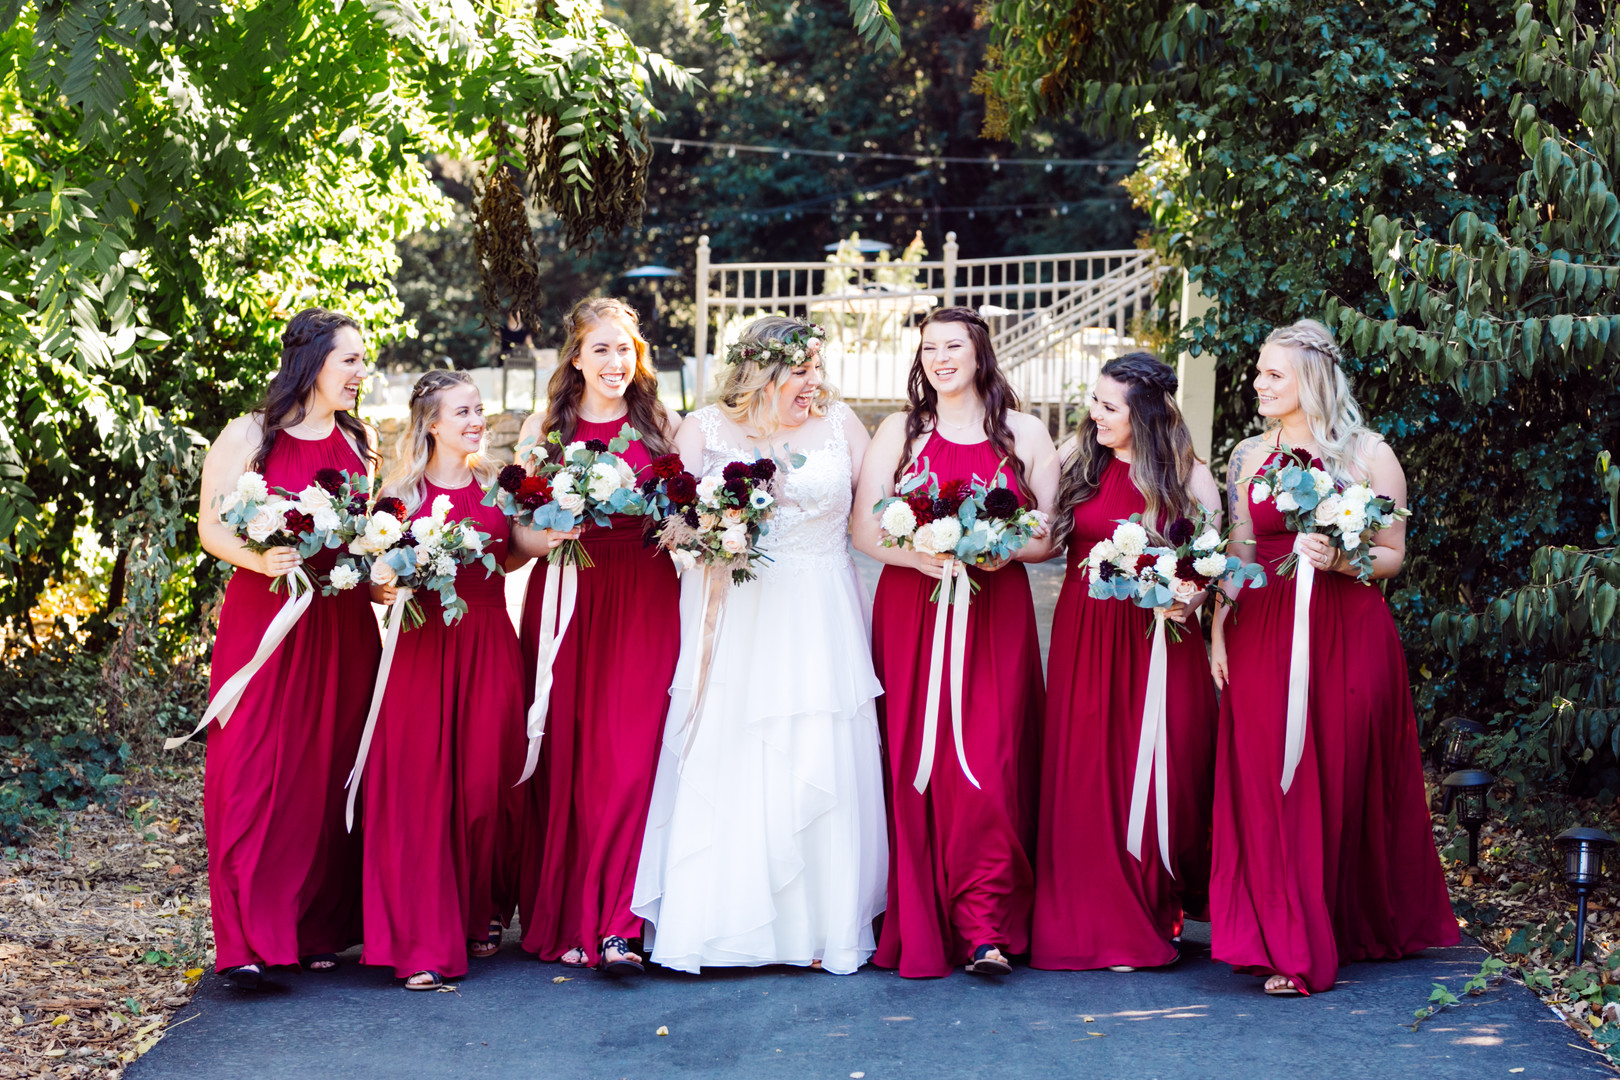 Marissa&Monroe-BridalPortraits-005.jpg